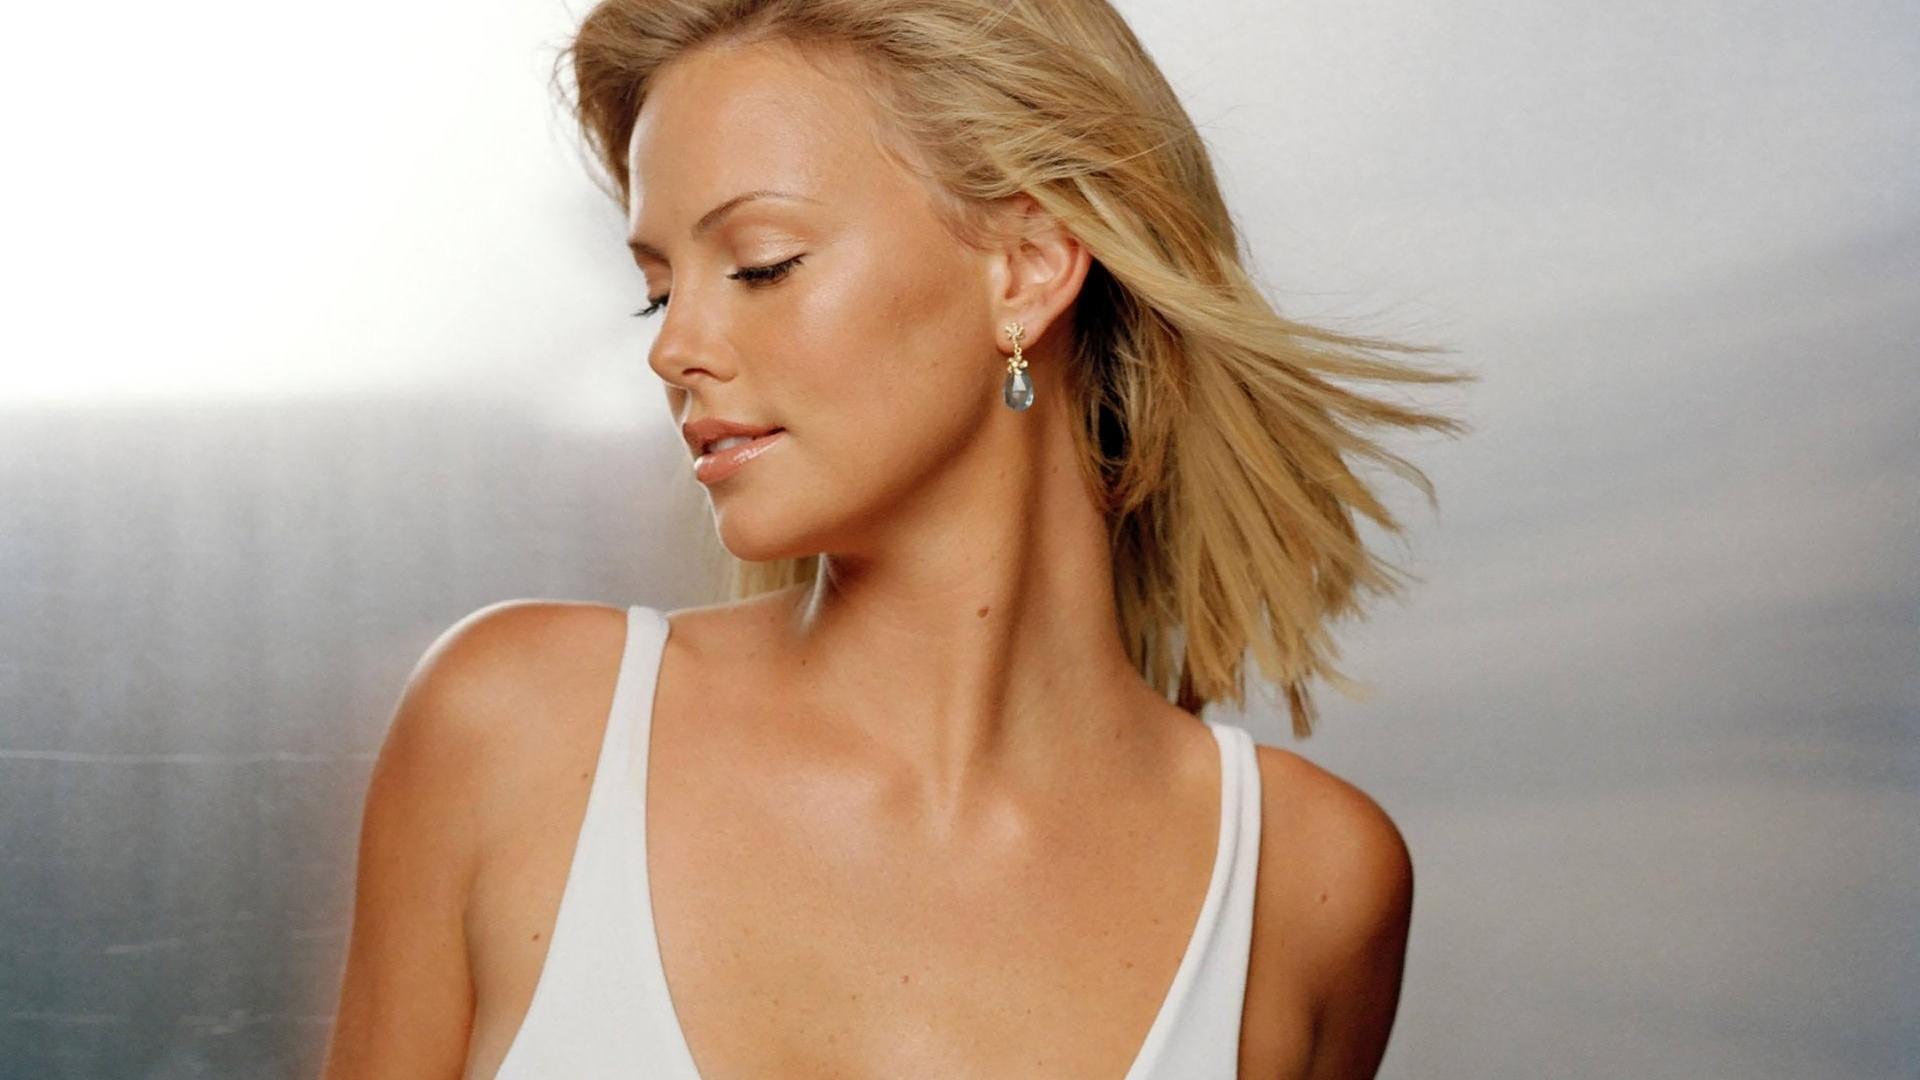 www.all-nude-celebrities.net # Nude Celebrities. …